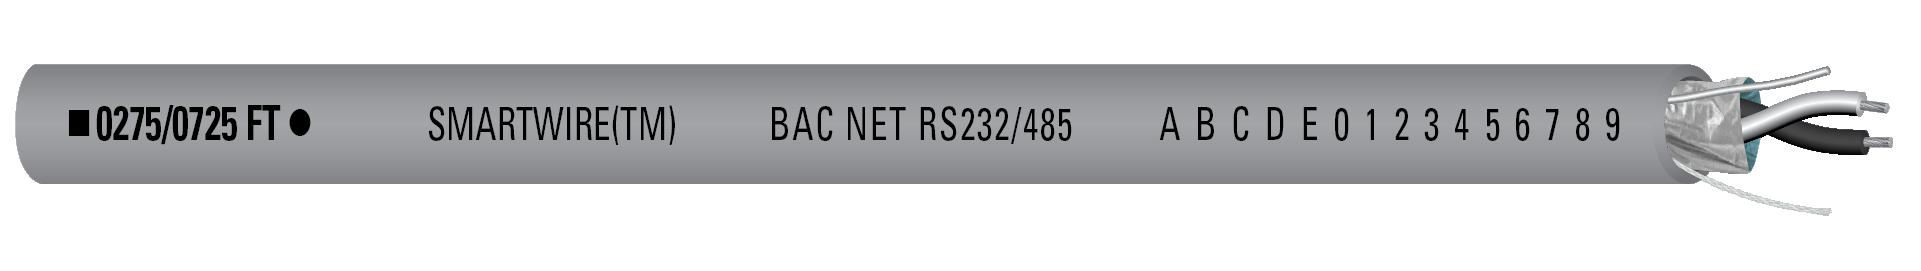 042001